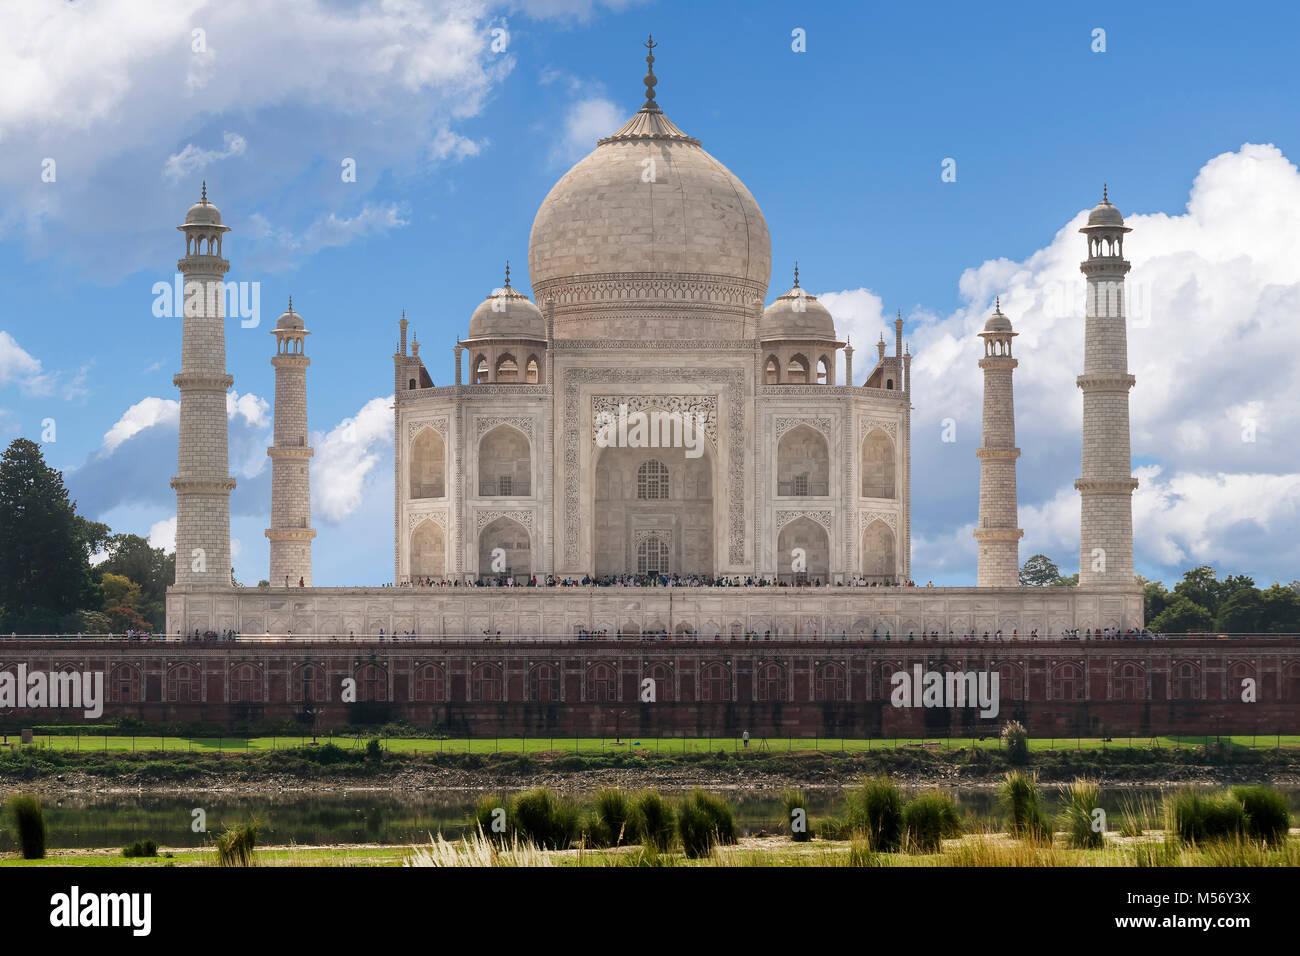 Beautiful view of Taj Mahal from river Yamuna, Agra, Uttar Pradesh, India - Stock Image